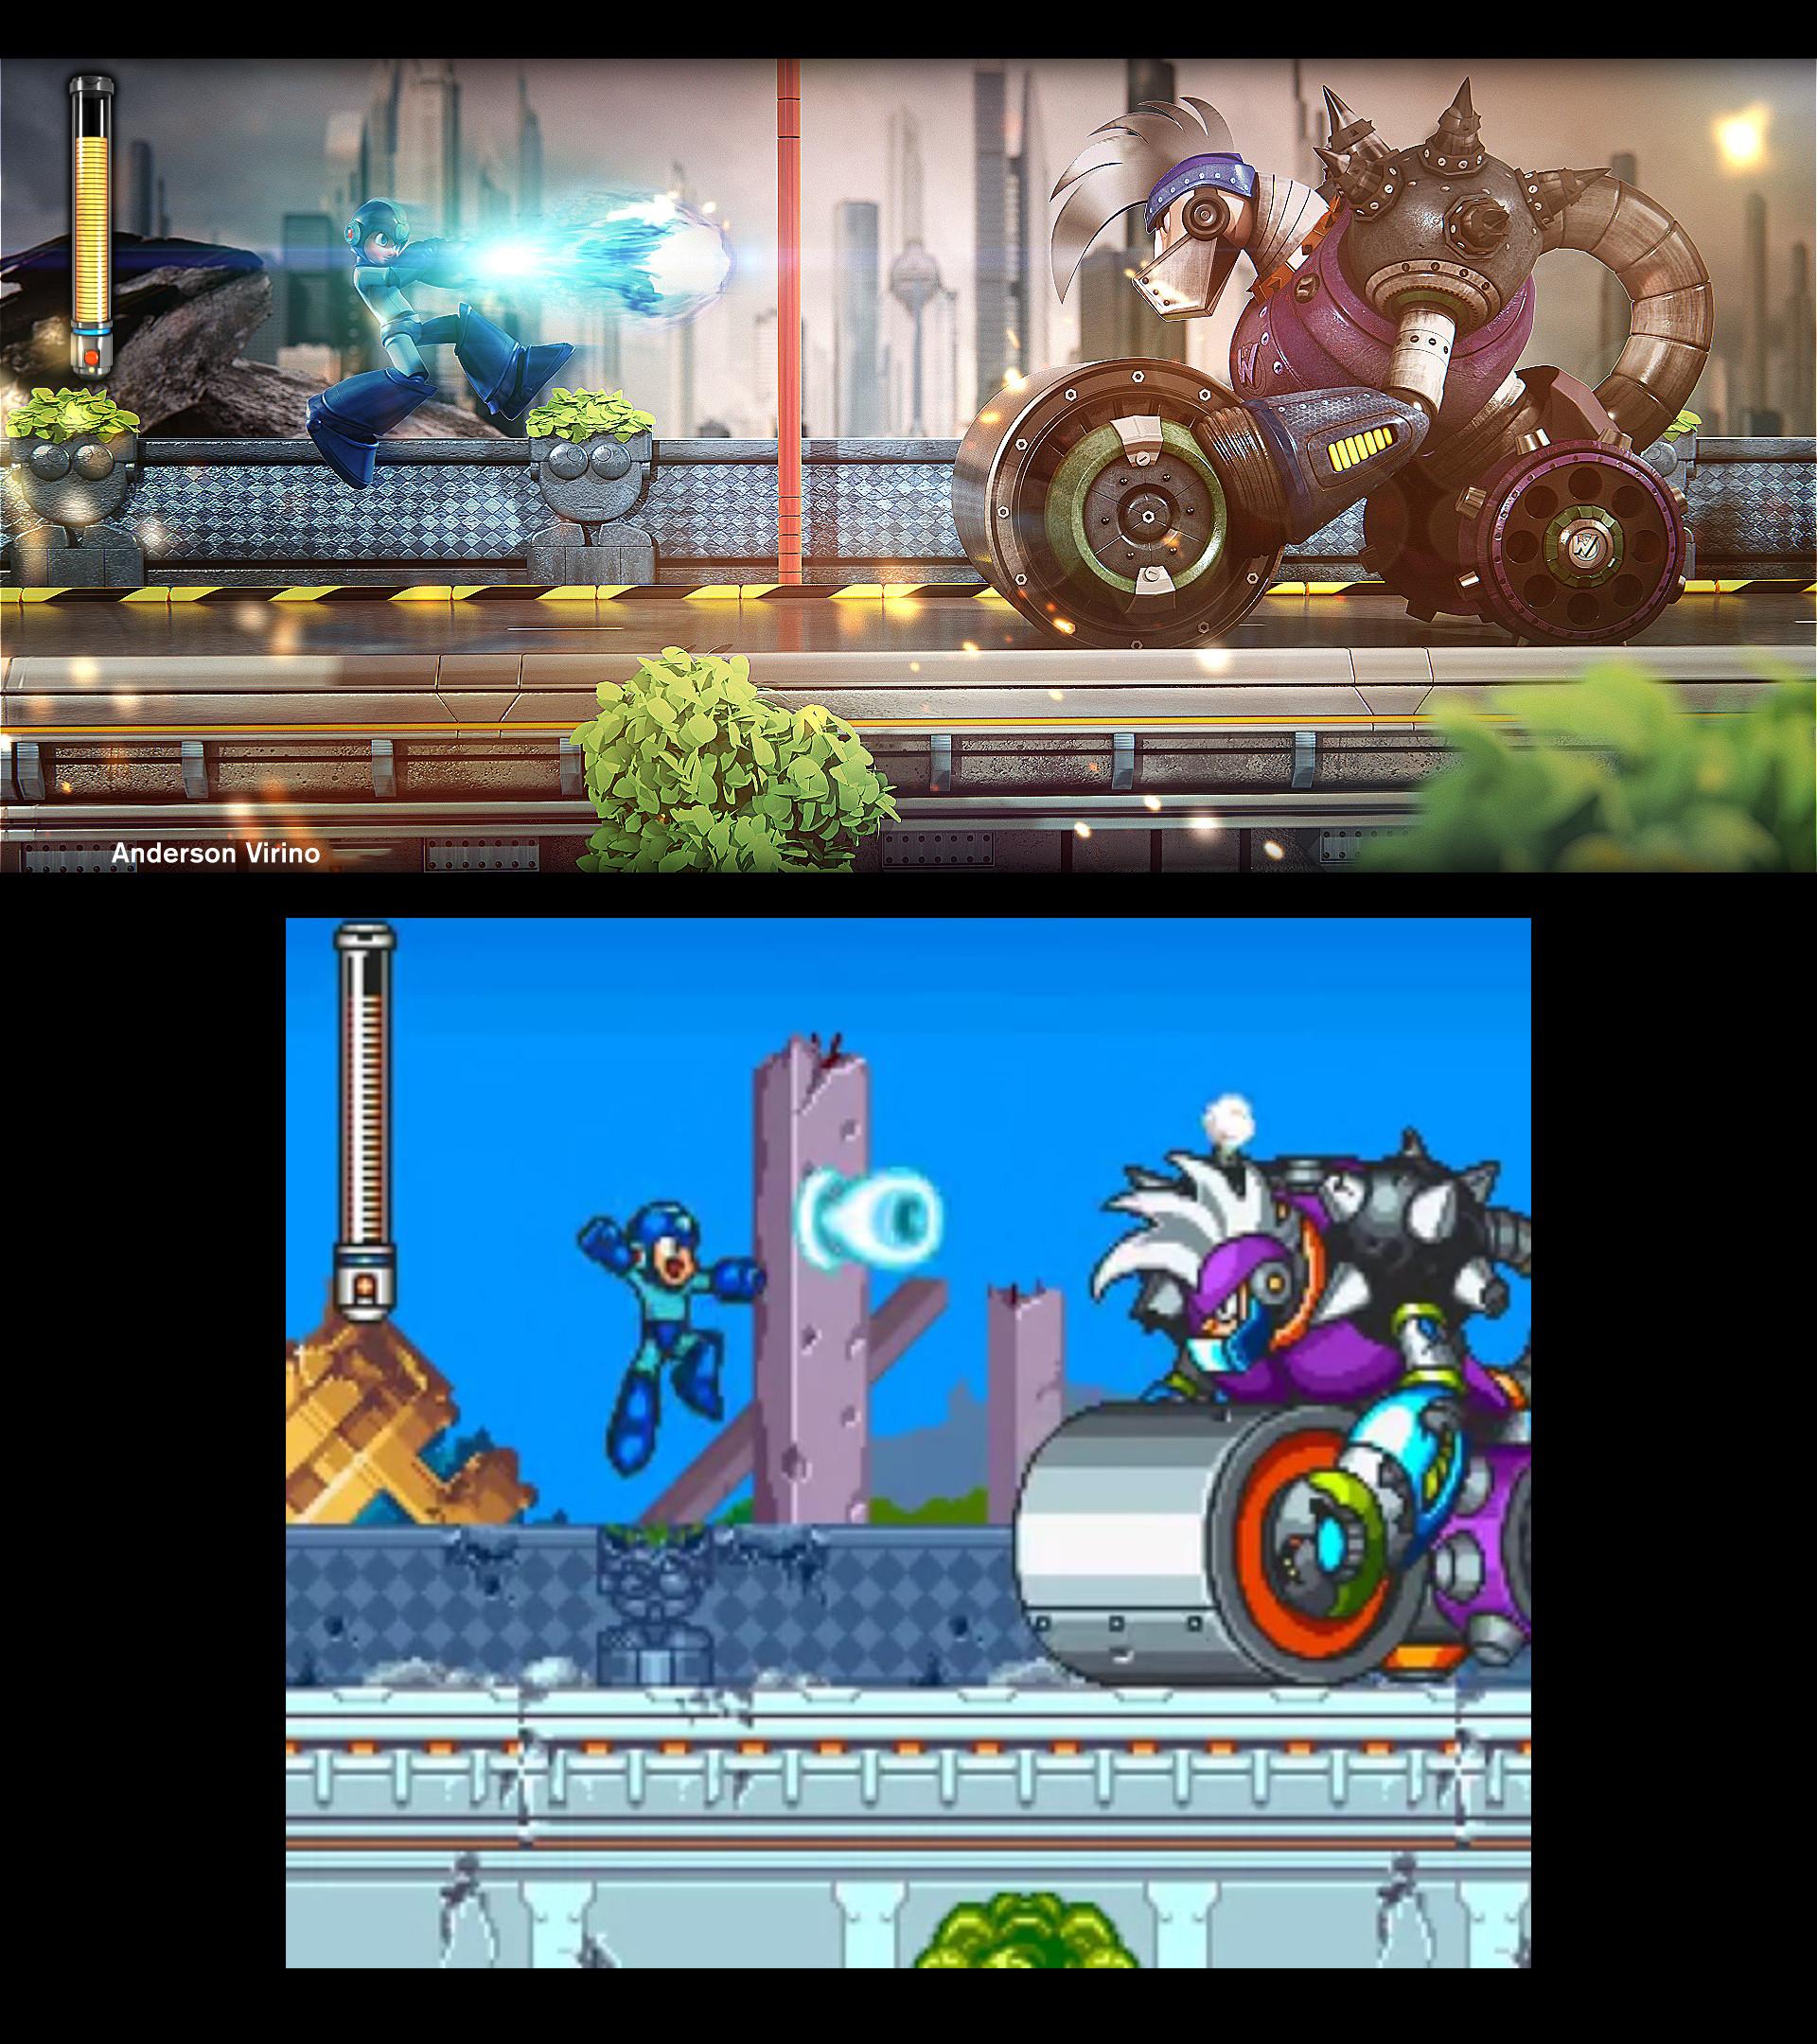 ArtStation - Megaman / Rockman cgi animation, Anderson Virino